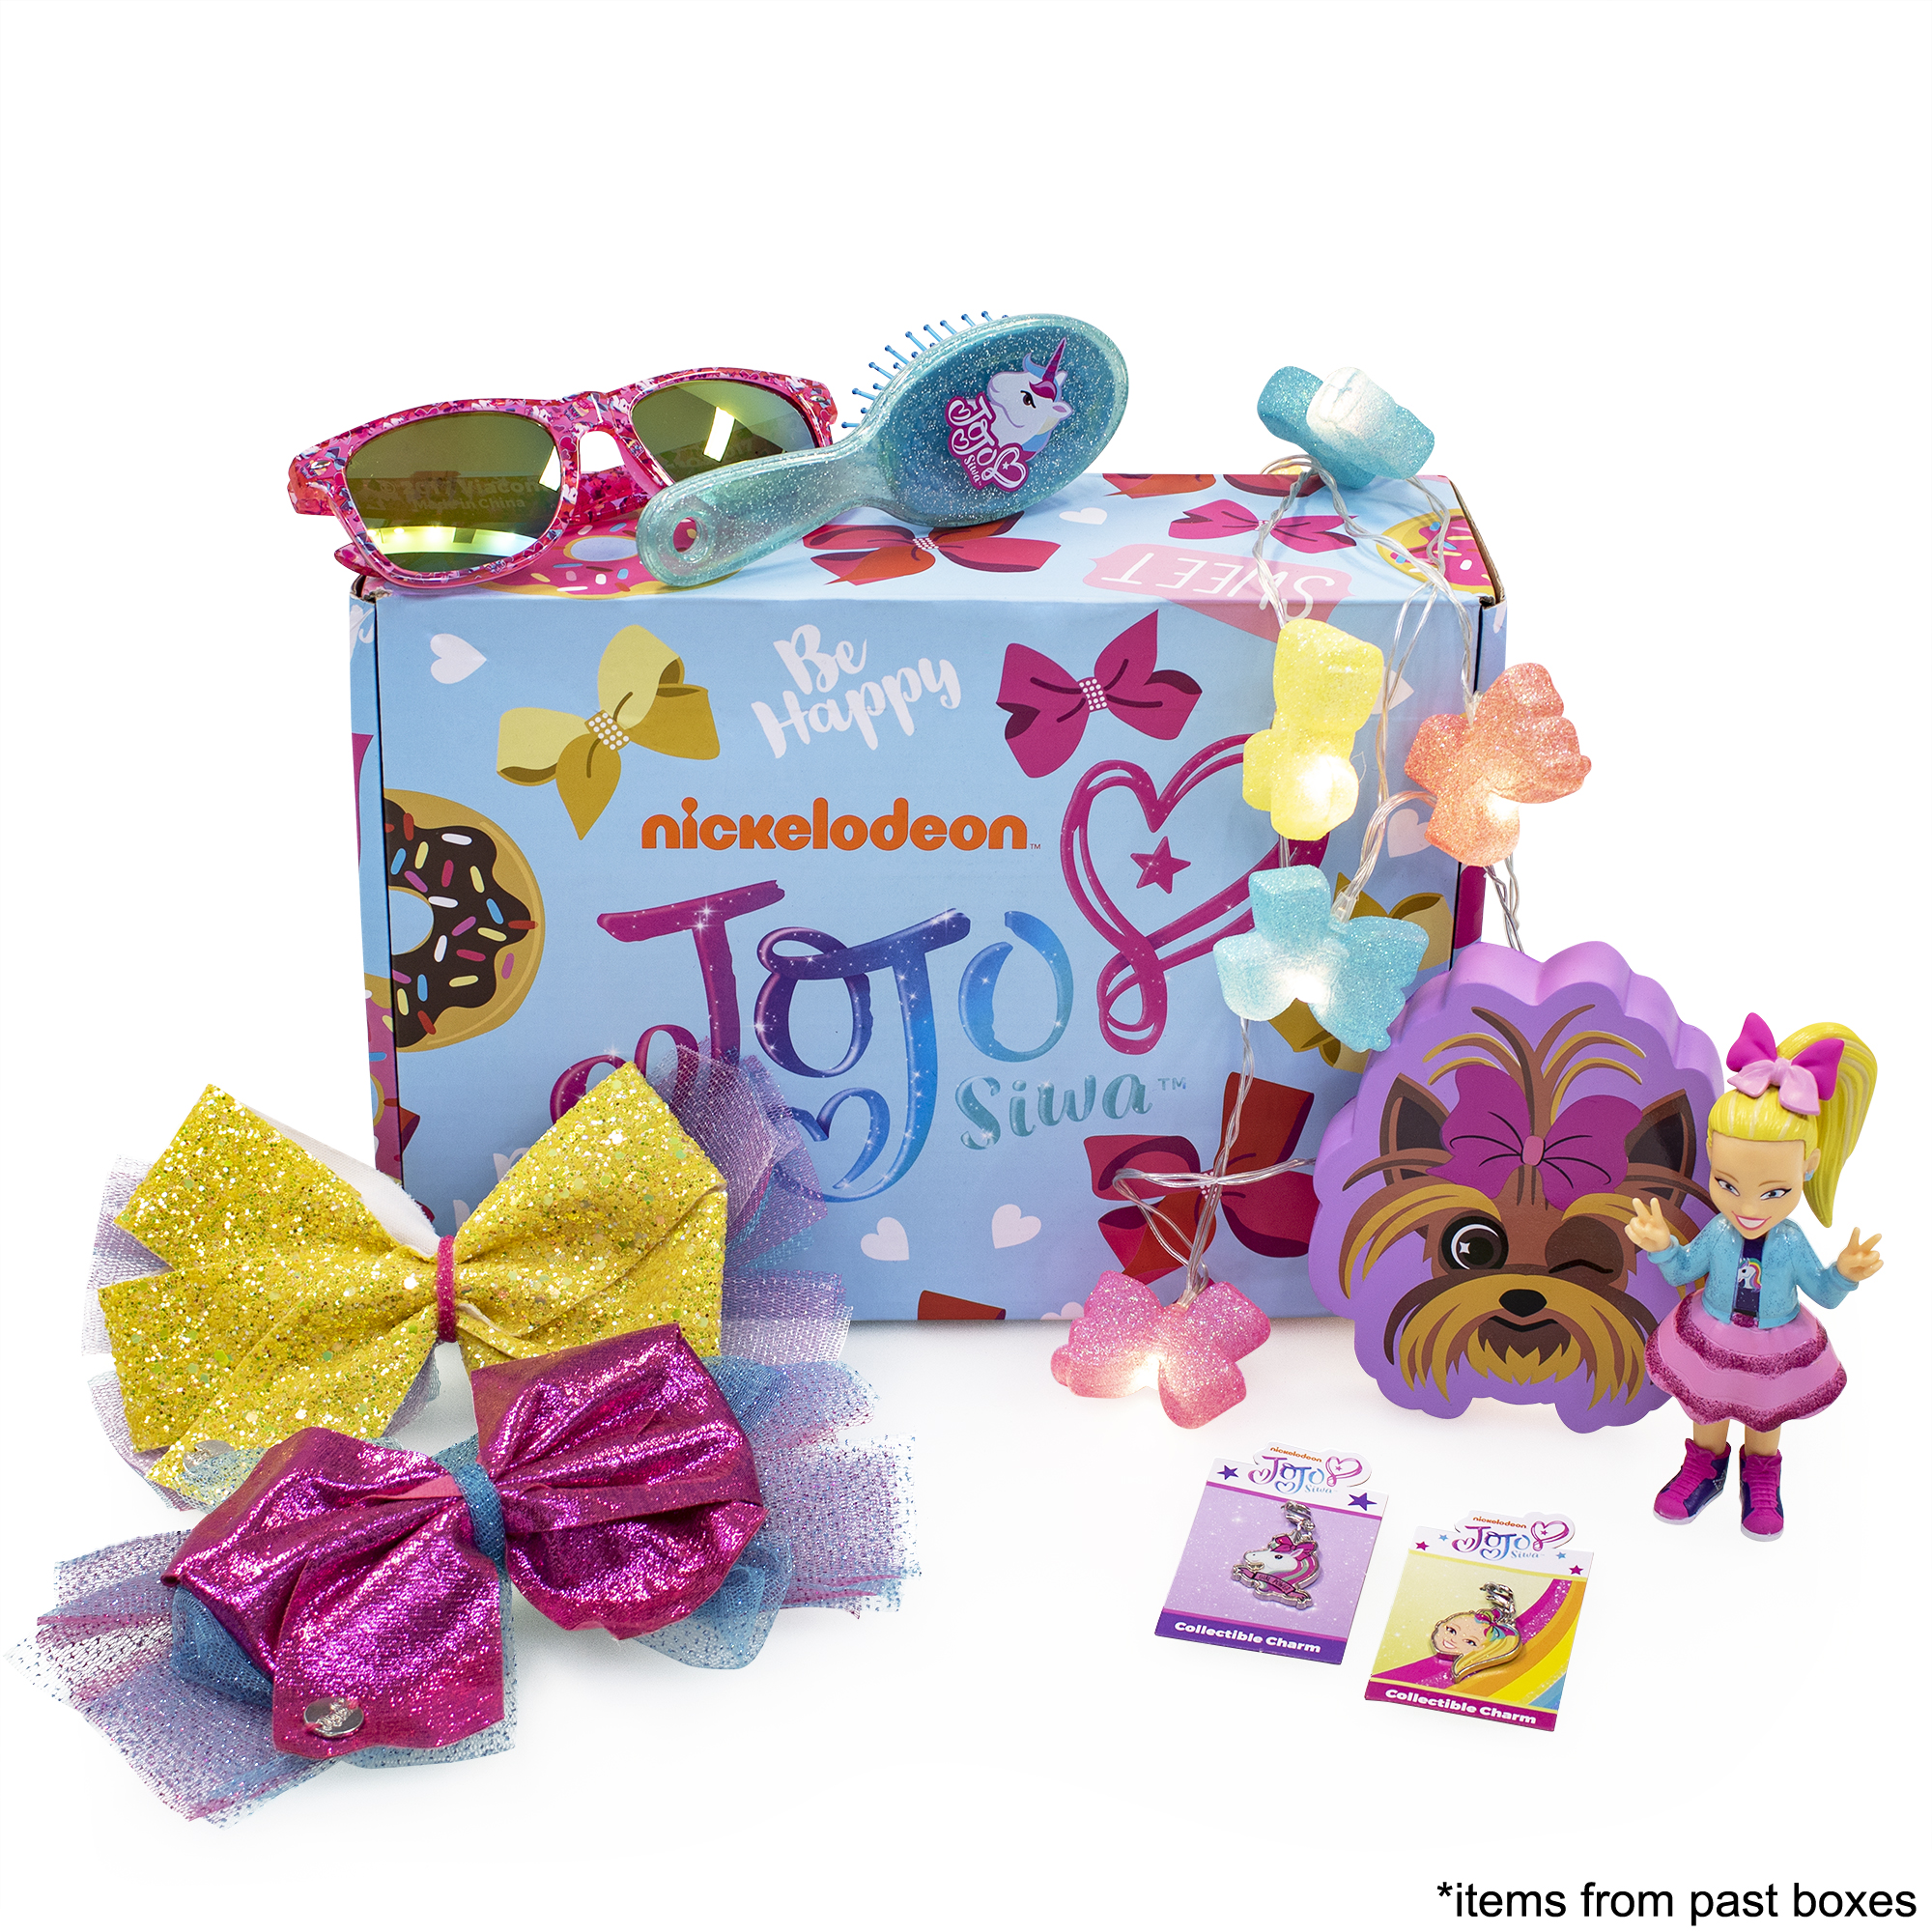 The JoJo Siwa Box - The Officially Licensed JoJo Siwa Mystery Gift Subscription Box